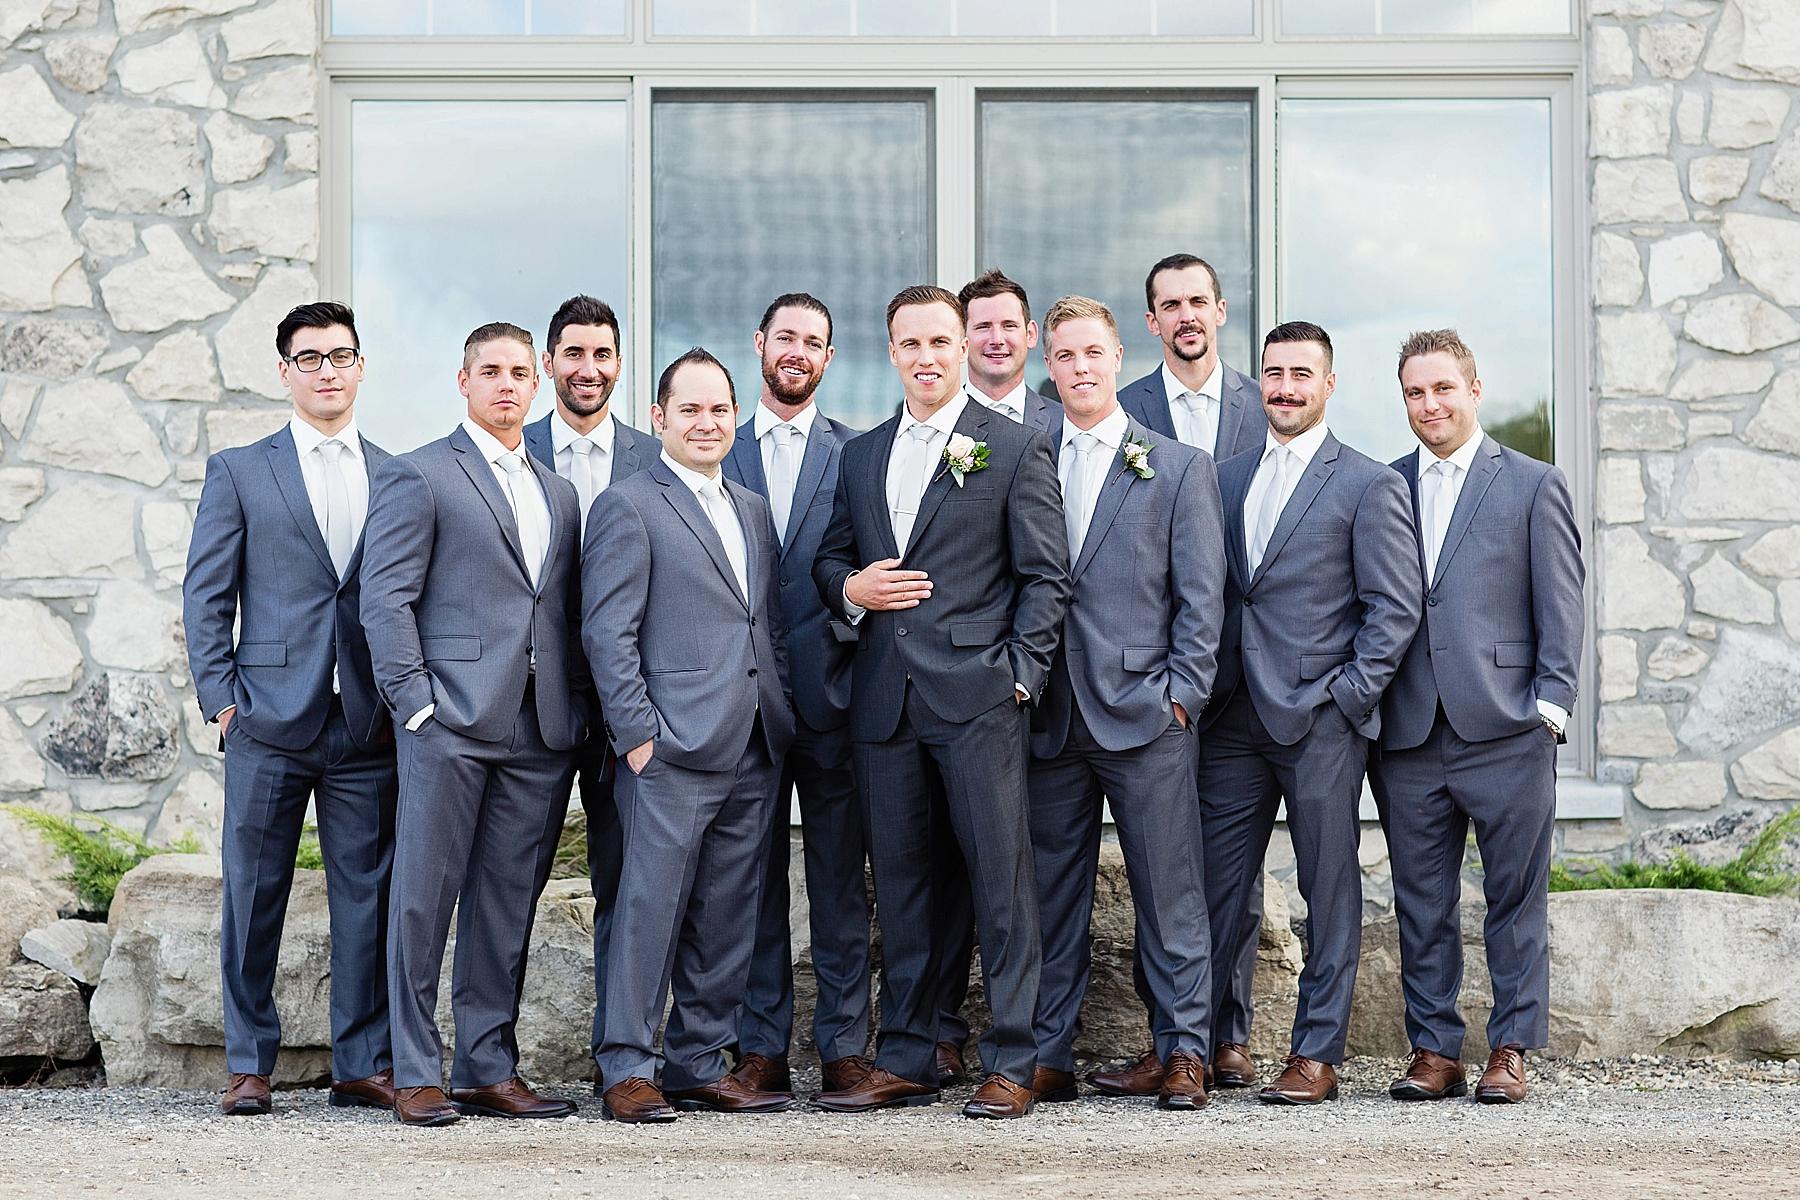 windsor-wedding-photographer-sprucewood-shores-winery-wedding-niagara-on-the-lake-wedding-photographer-eryn-shea-photography_0028.jpg